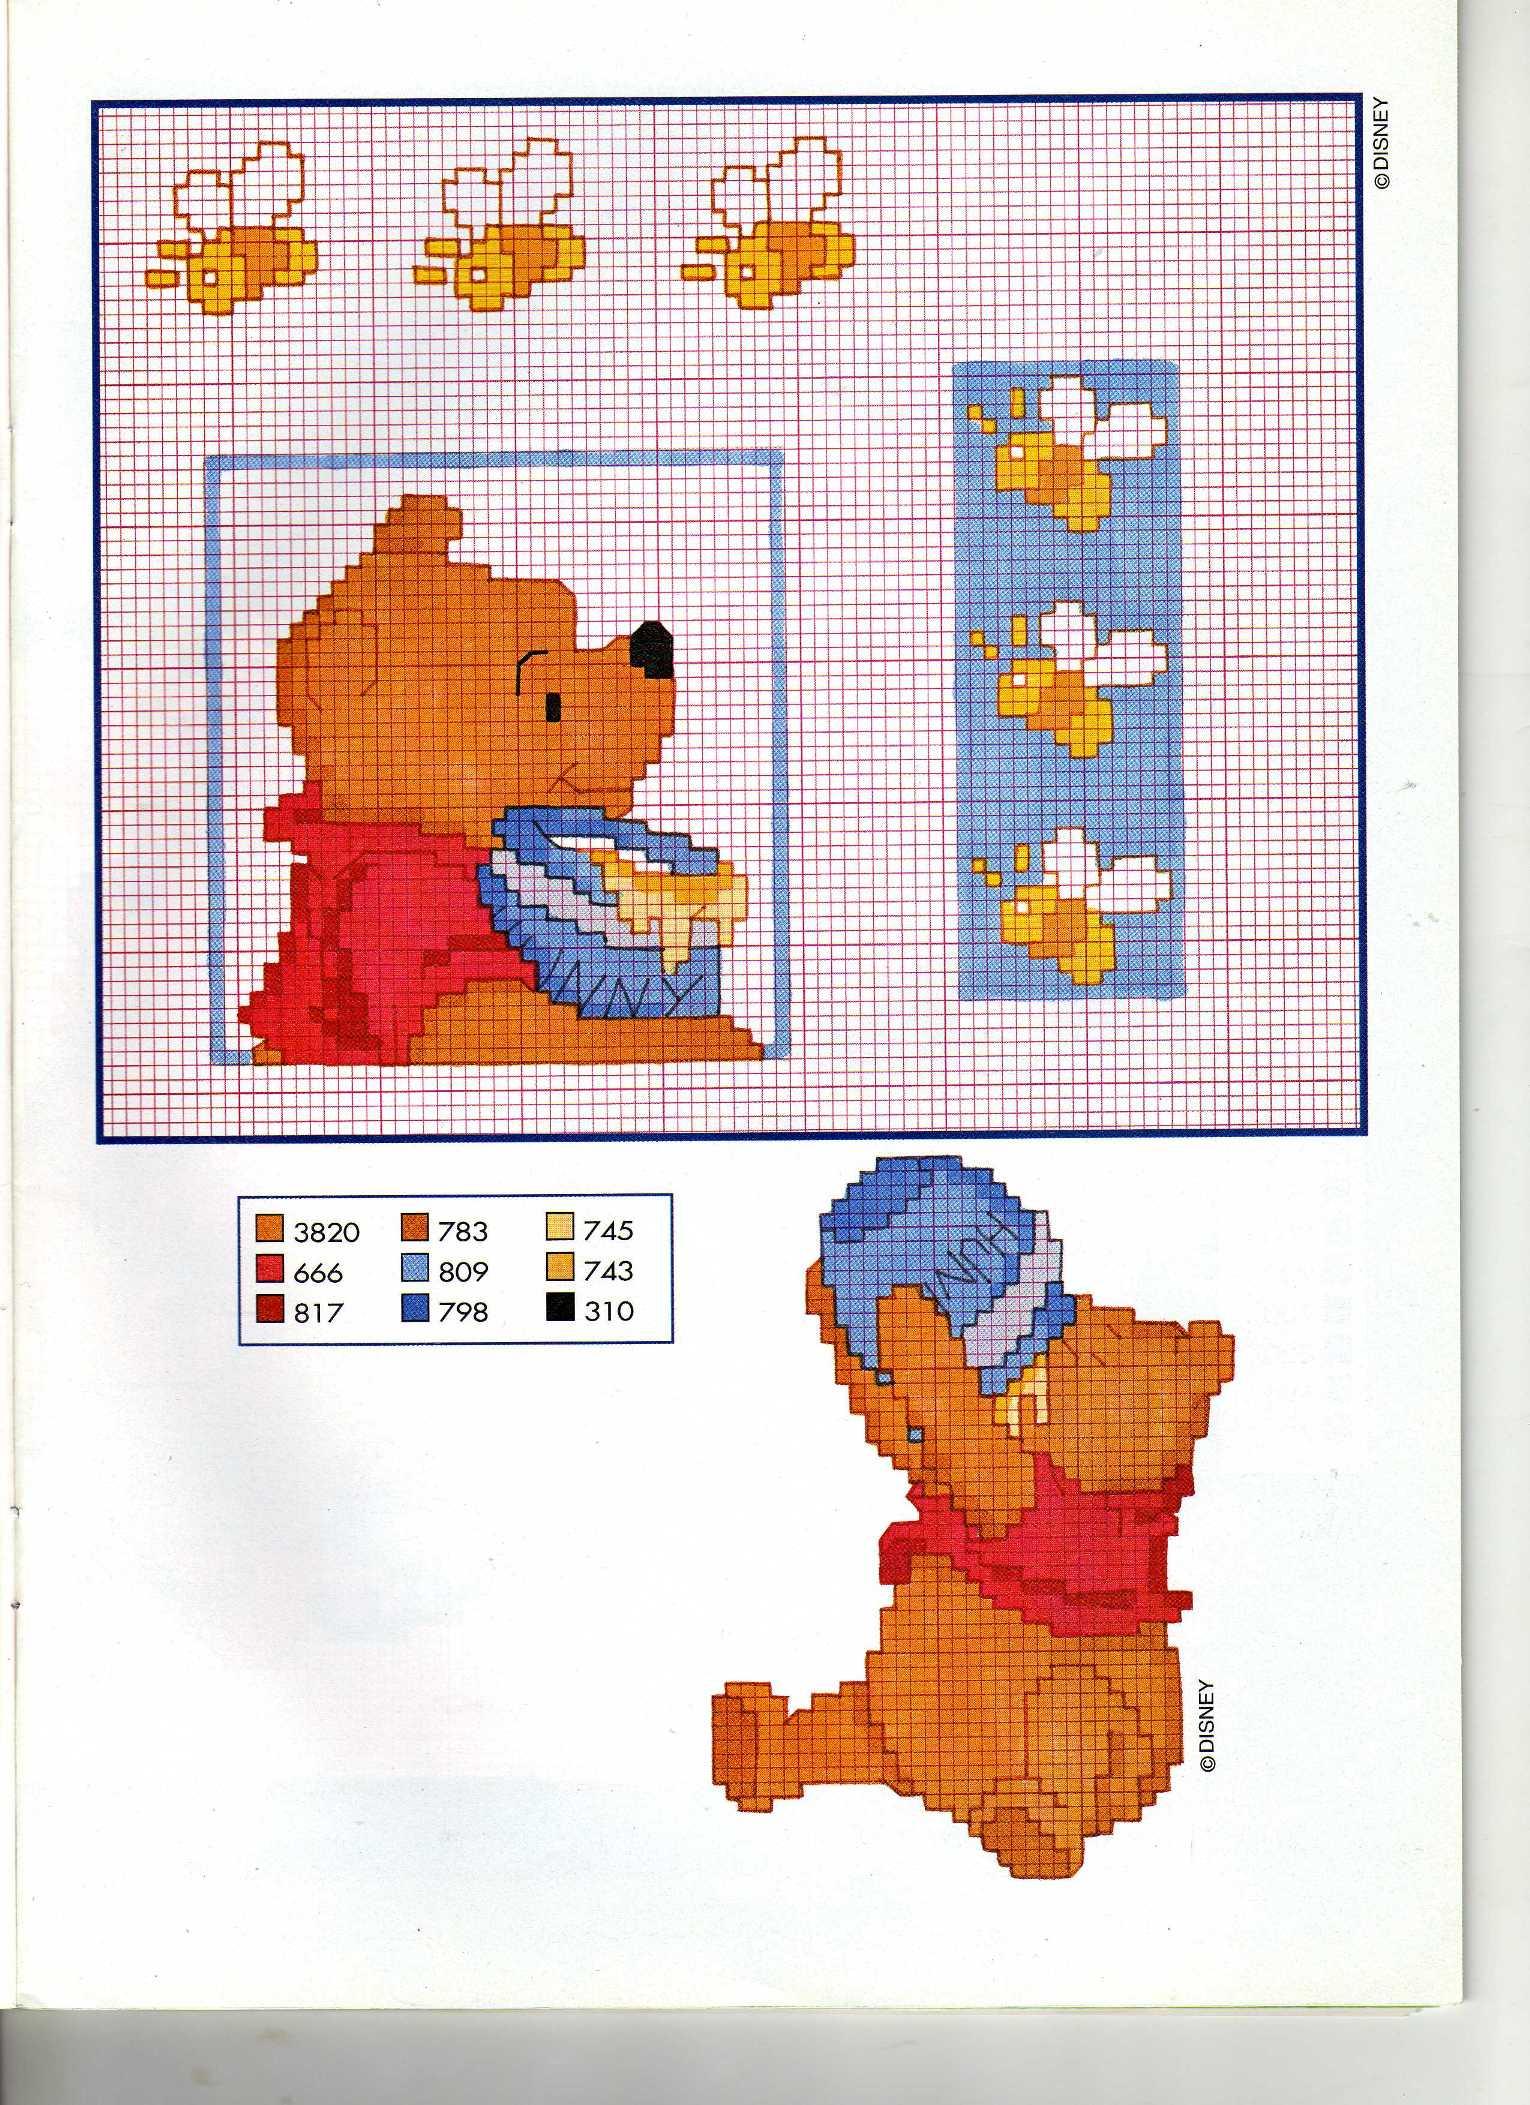 Winnie the pooh con barattolo miele e api for Winnie the pooh punto croce